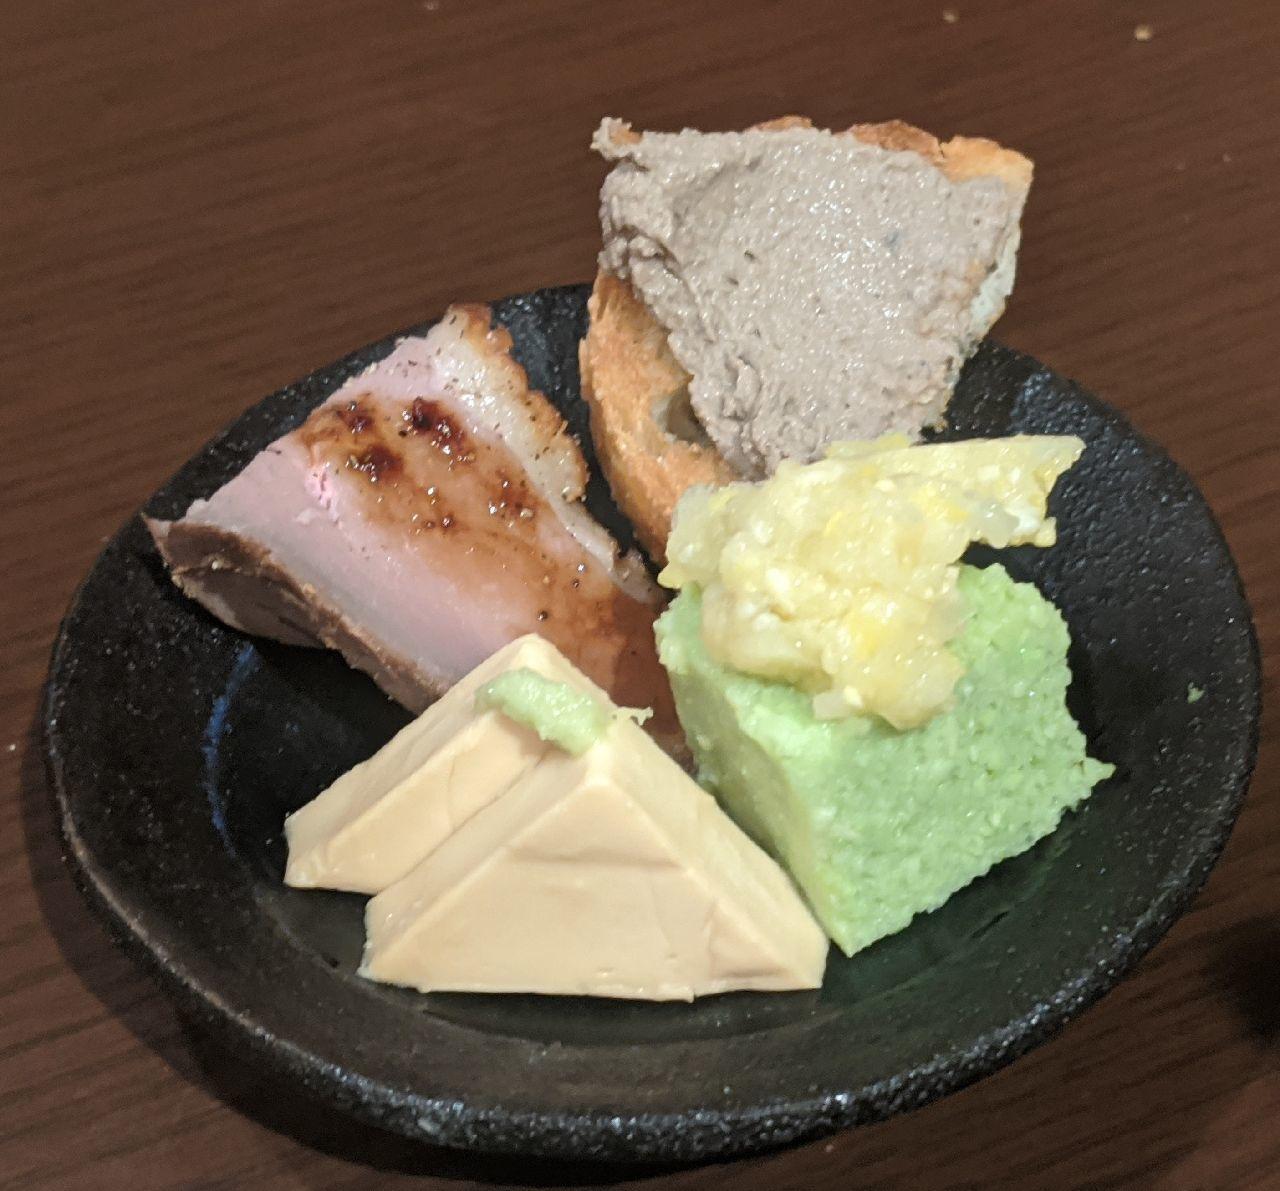 MVIMG_20200813_202148おつまみプレート(クリームチーズの醤油漬け、枝豆煮凝りとうもろこしすり流し、レバーペースト、合鴨燻製)